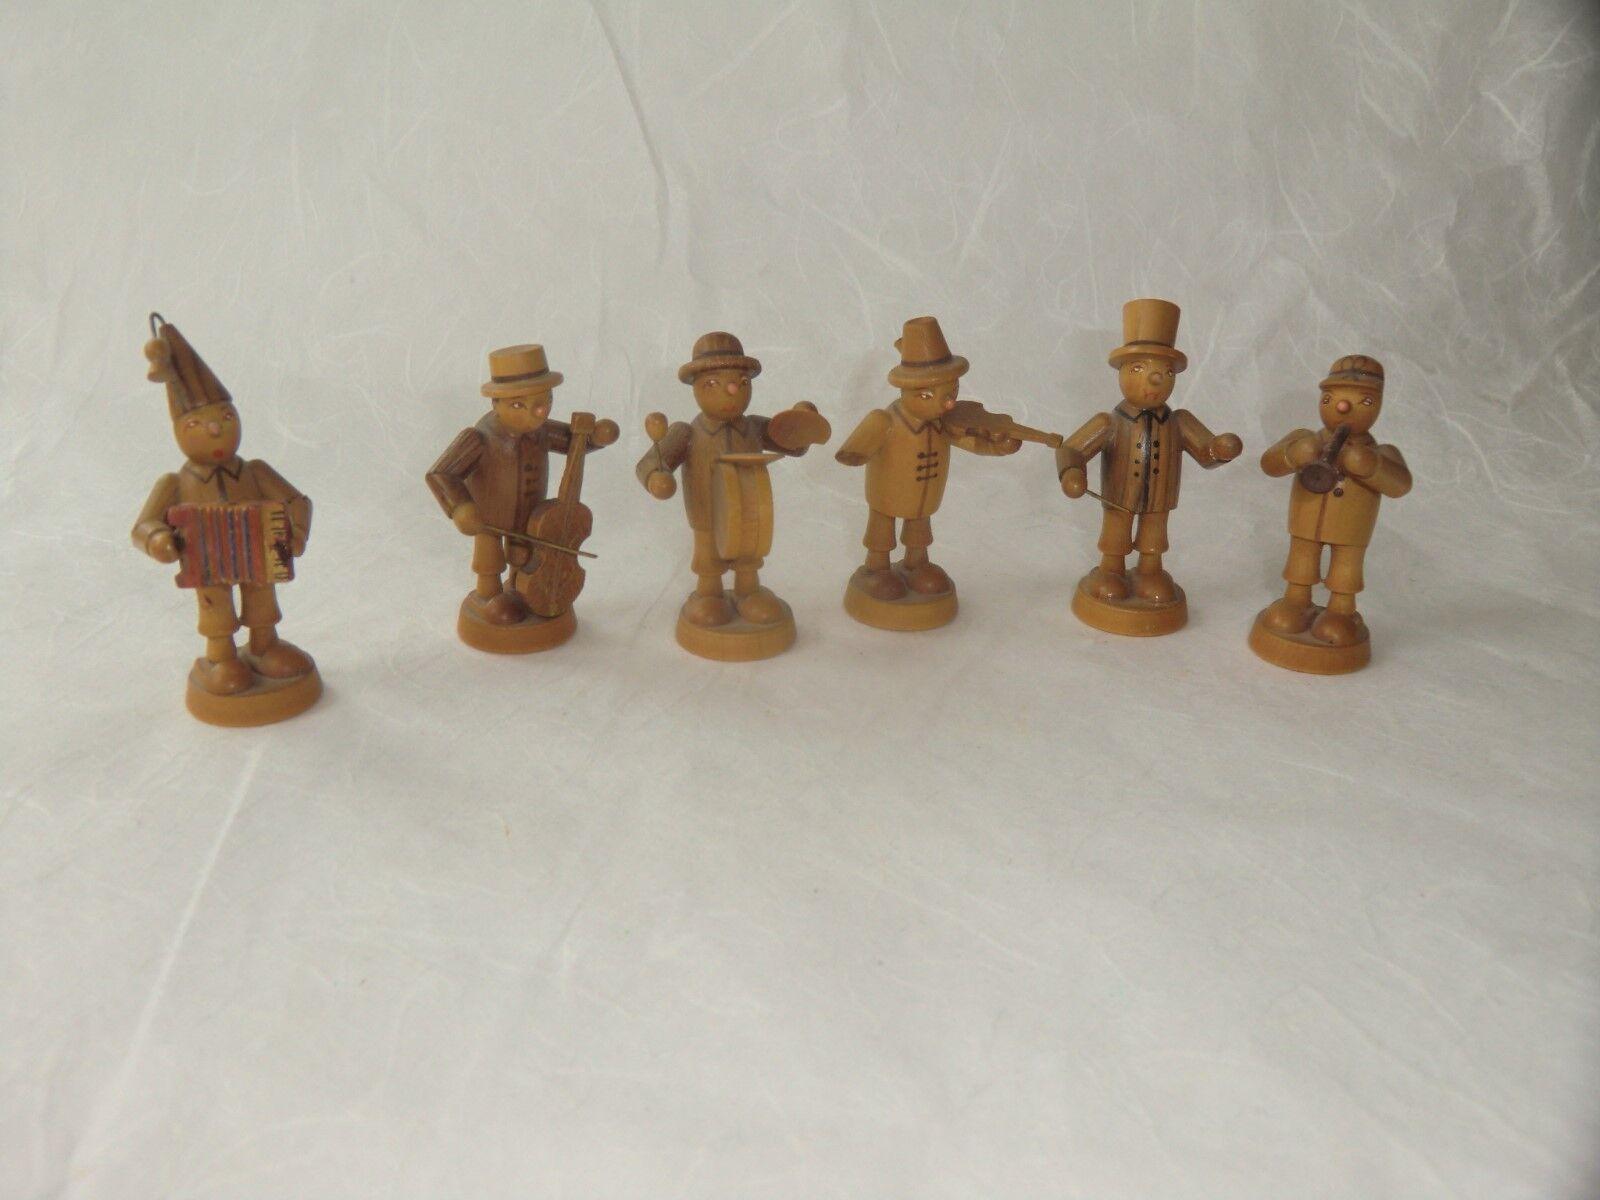 Antike Holzfiguren 6 Musikanten Holz sammeln selten ca. 4 5 cm Kult Deko Vitrine